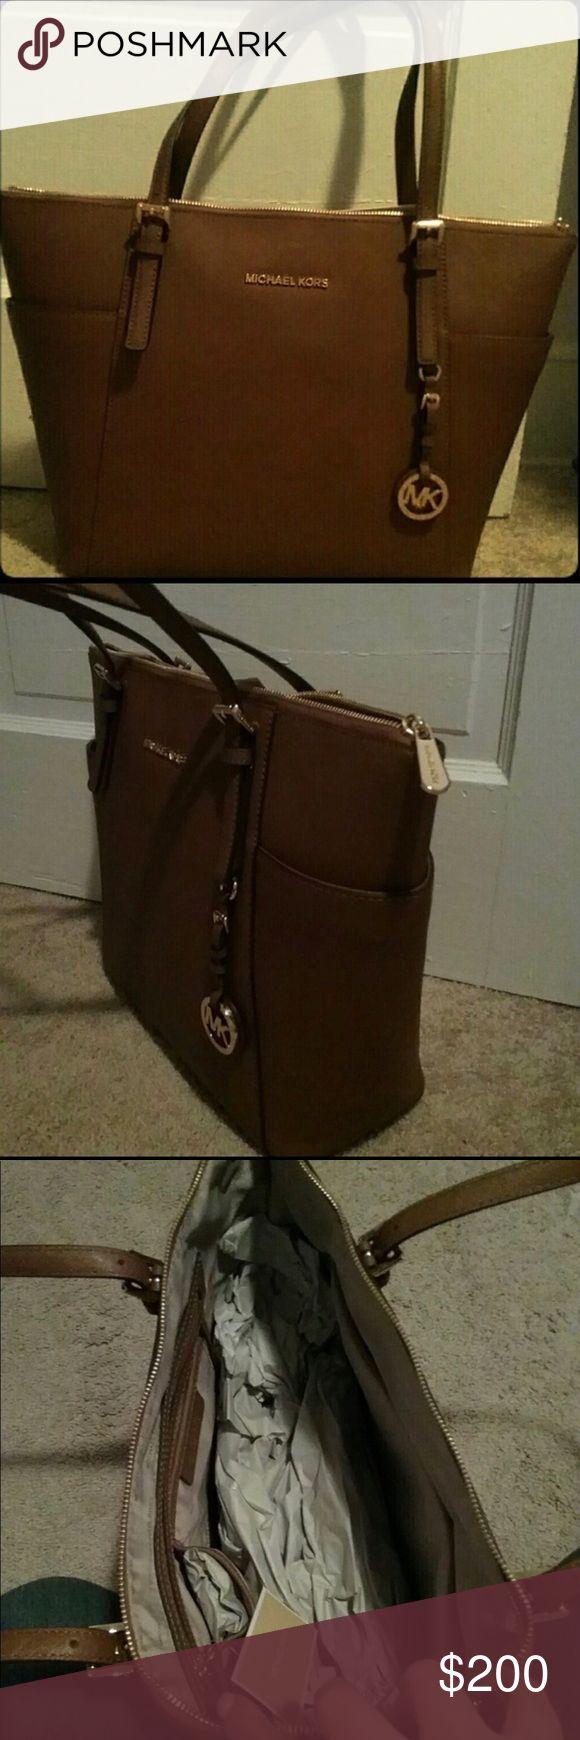 NWT Michael Kors Jet Set Bag Light Brown New with tags never used or worn! Michael Kors Bags Totes